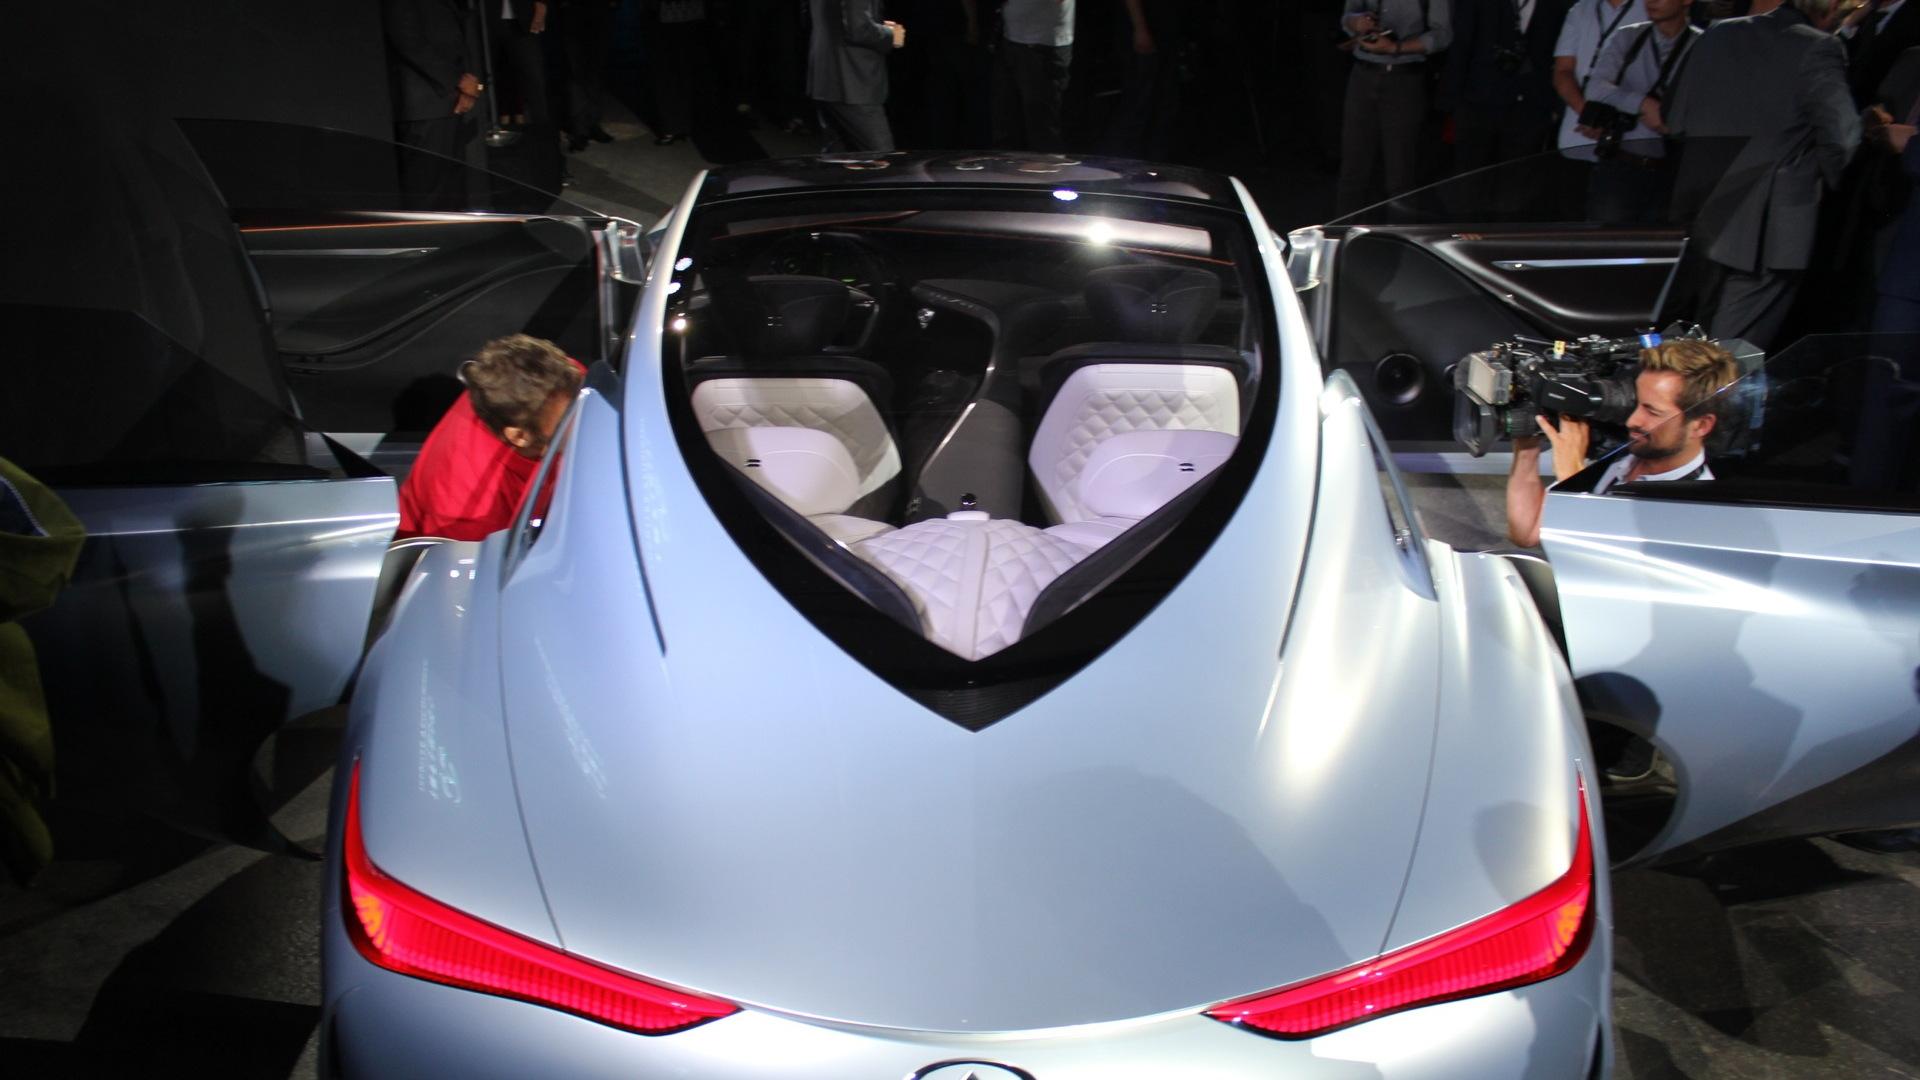 Infiniti Q80 Inspiration Concept  -  2014 Paris Auto Show (private event)